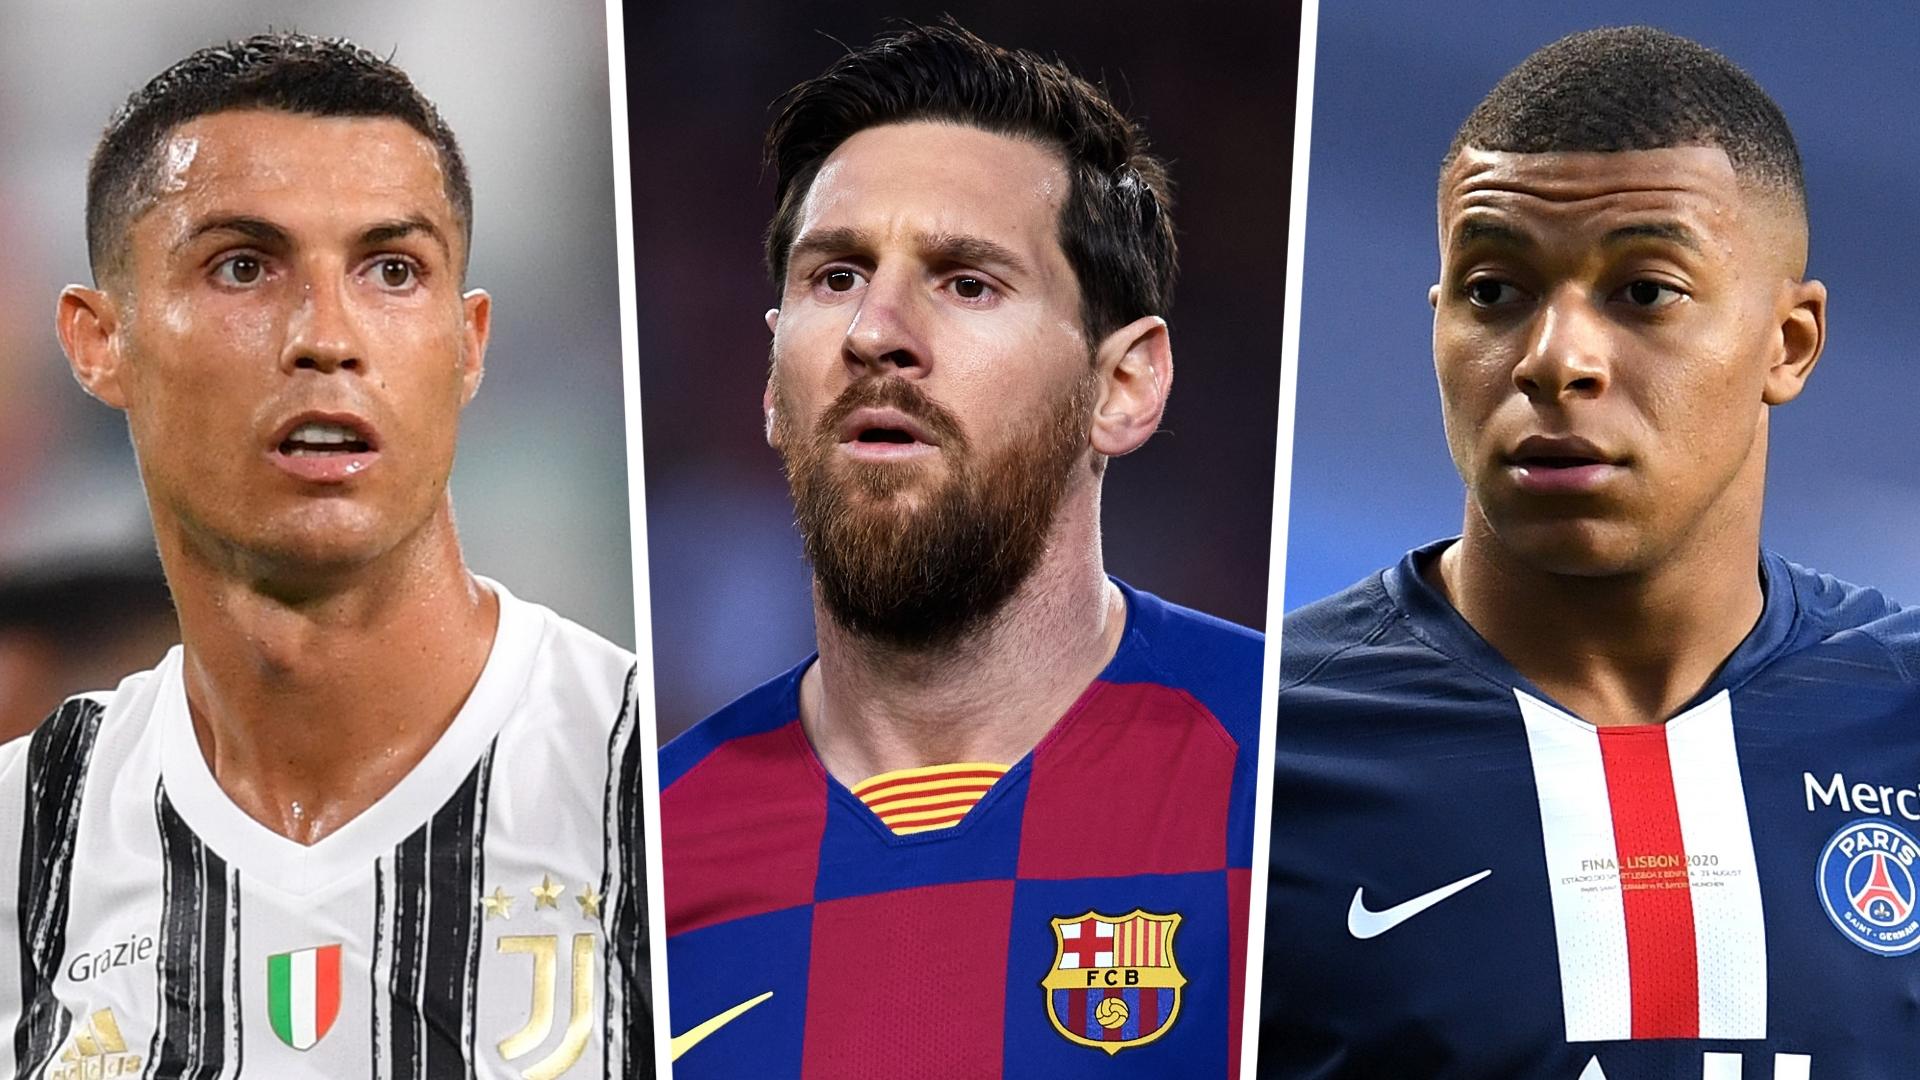 FIFA 21 ratings: Messi, Ronaldo, Mbappe & top 100 players ranked